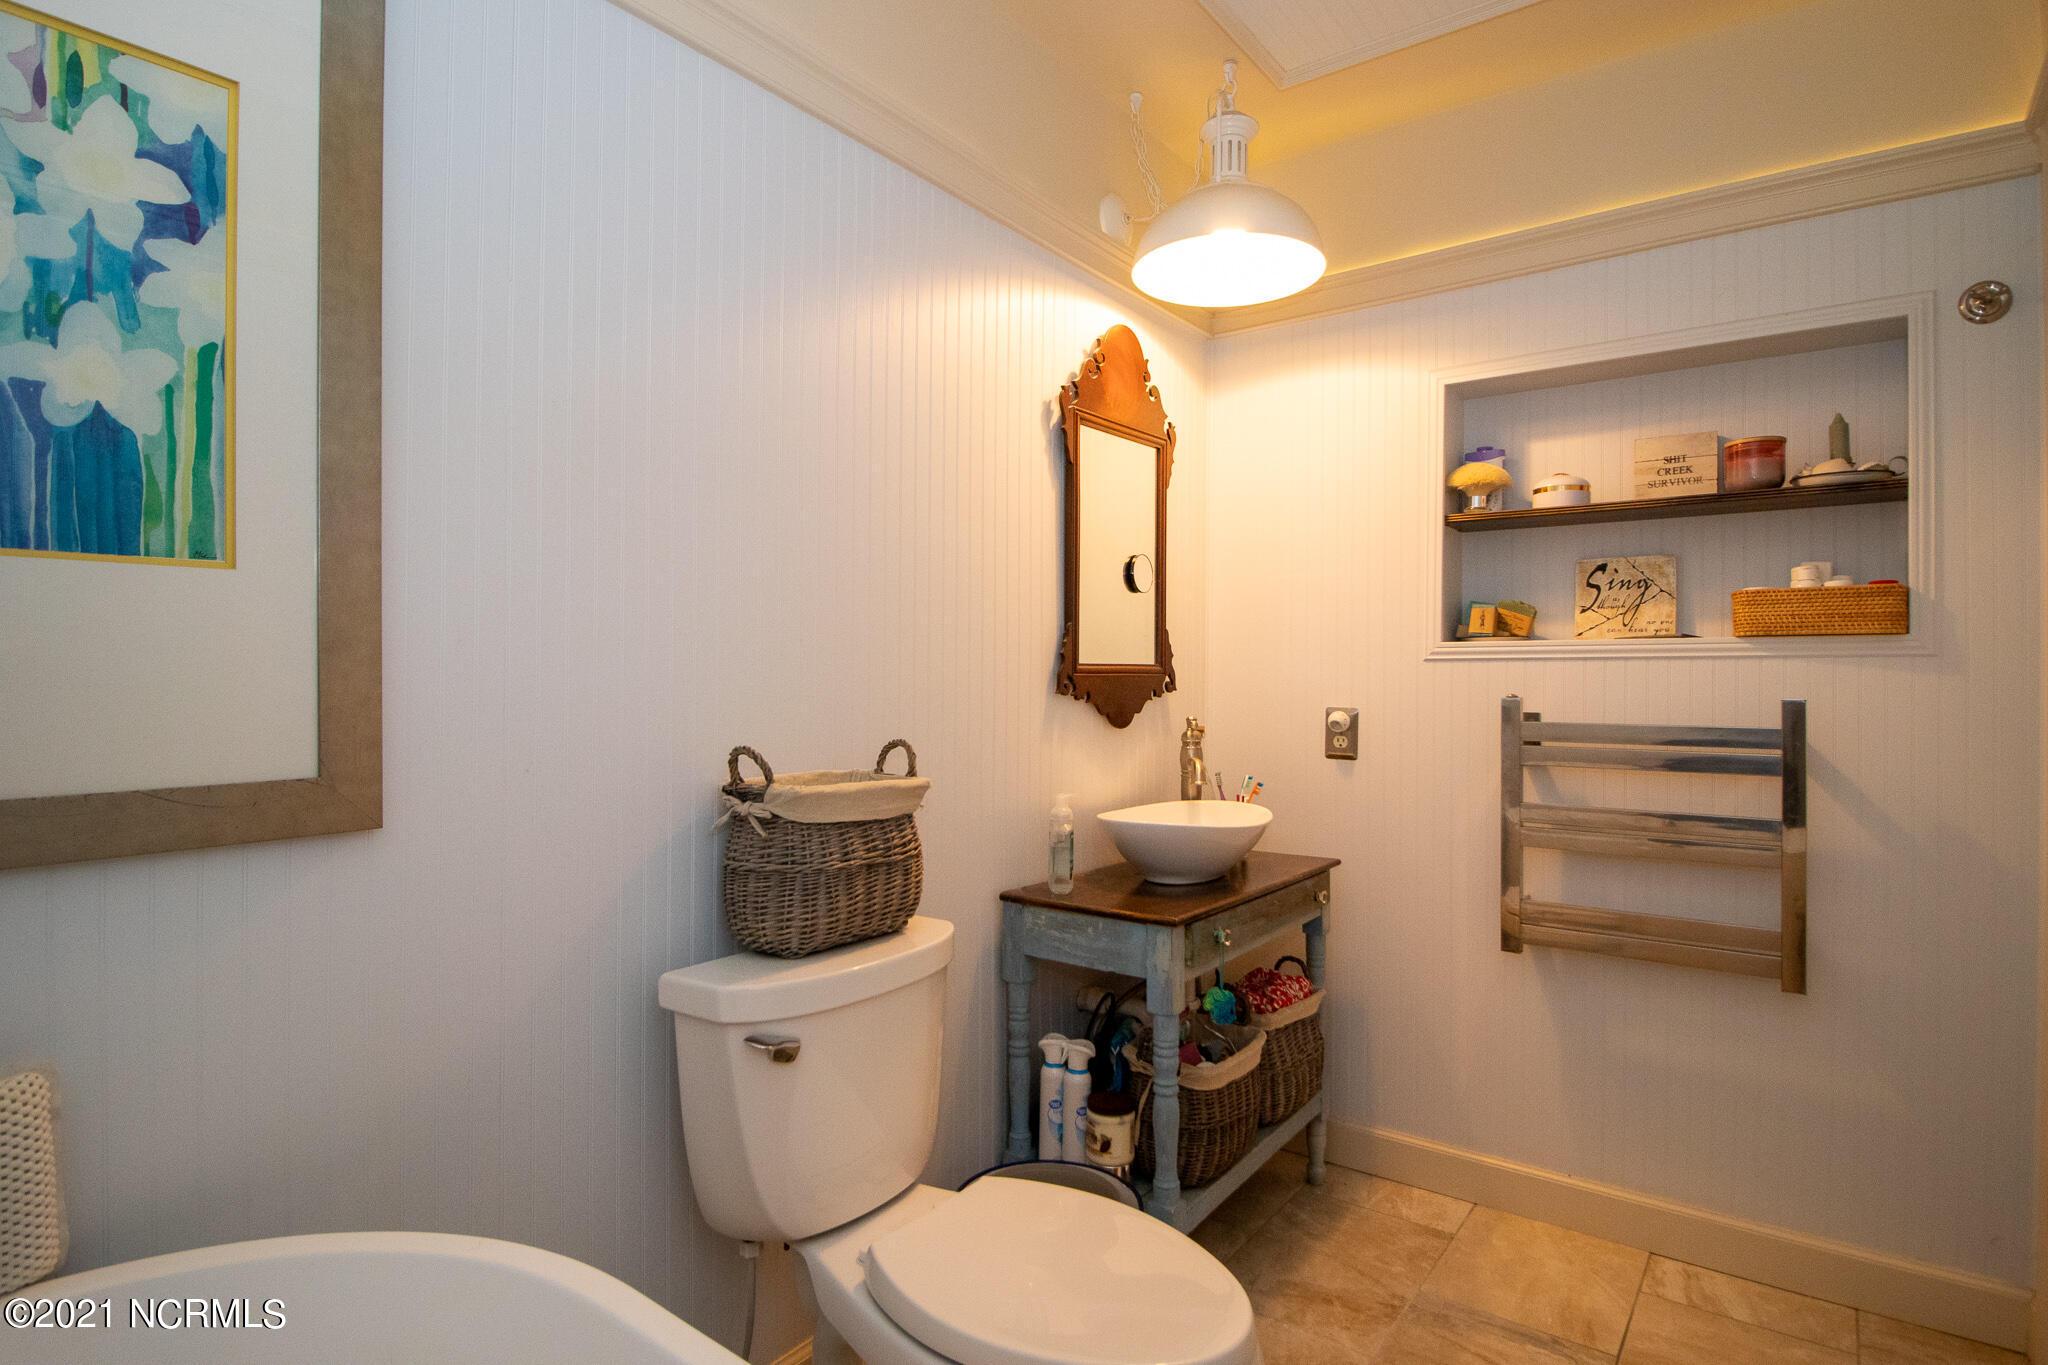 7301 Sound Drive, Emerald Isle, North Carolina 28594, 3 Bedrooms Bedrooms, 4 Rooms Rooms,2 BathroomsBathrooms,Condominium,For sale,Sound,100286288